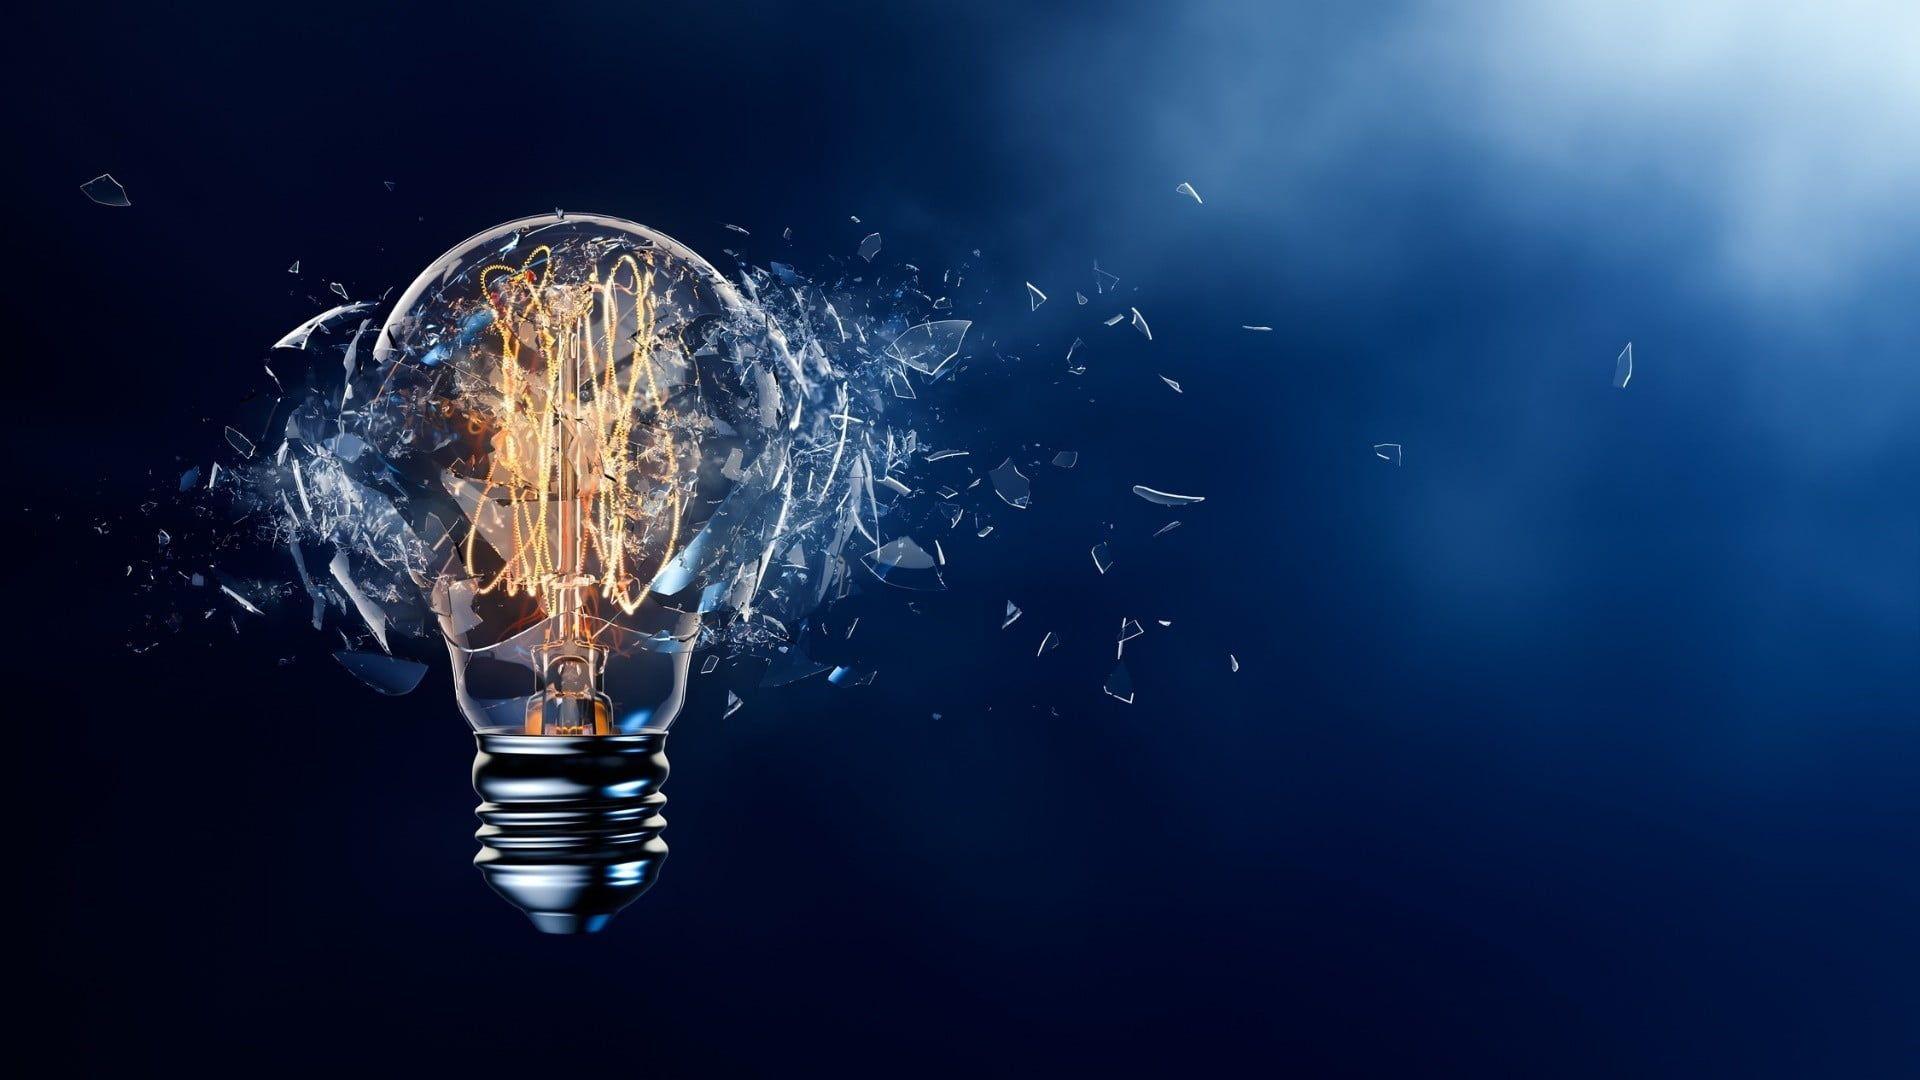 Electric Bulb Illustration Digital Art Lightbulb Broken Glass 1080p Wallpaper Hdwallpap Small Business Solutions Starting A Business Digital Transformation Digital transformation wallpaper hd